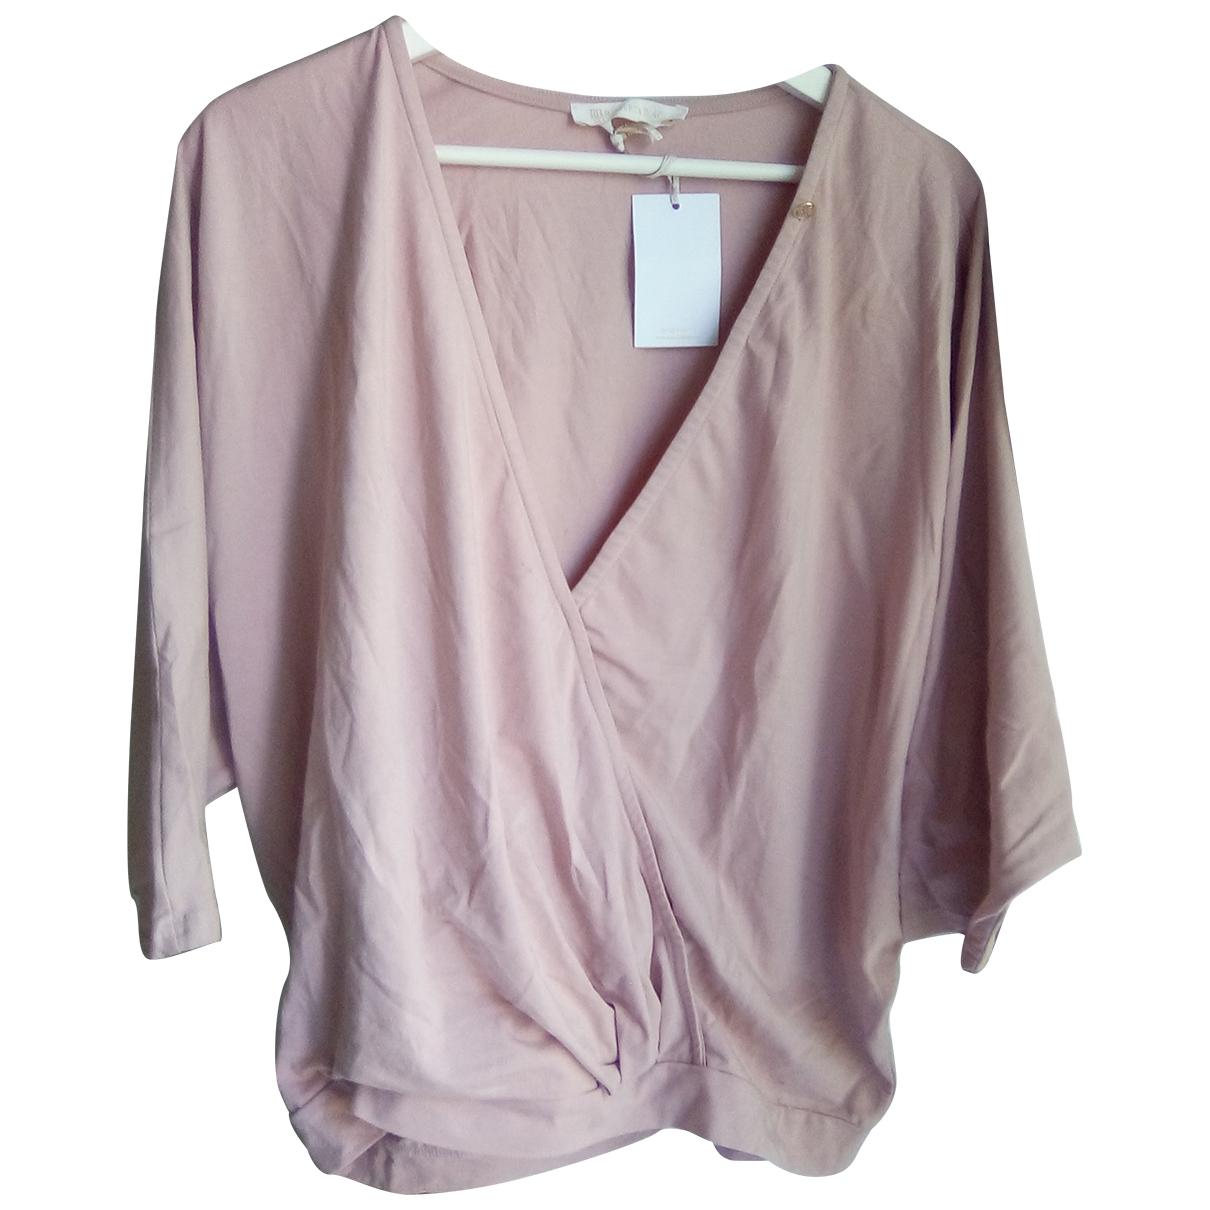 - Top Manche ballon pour femme en coton - rose